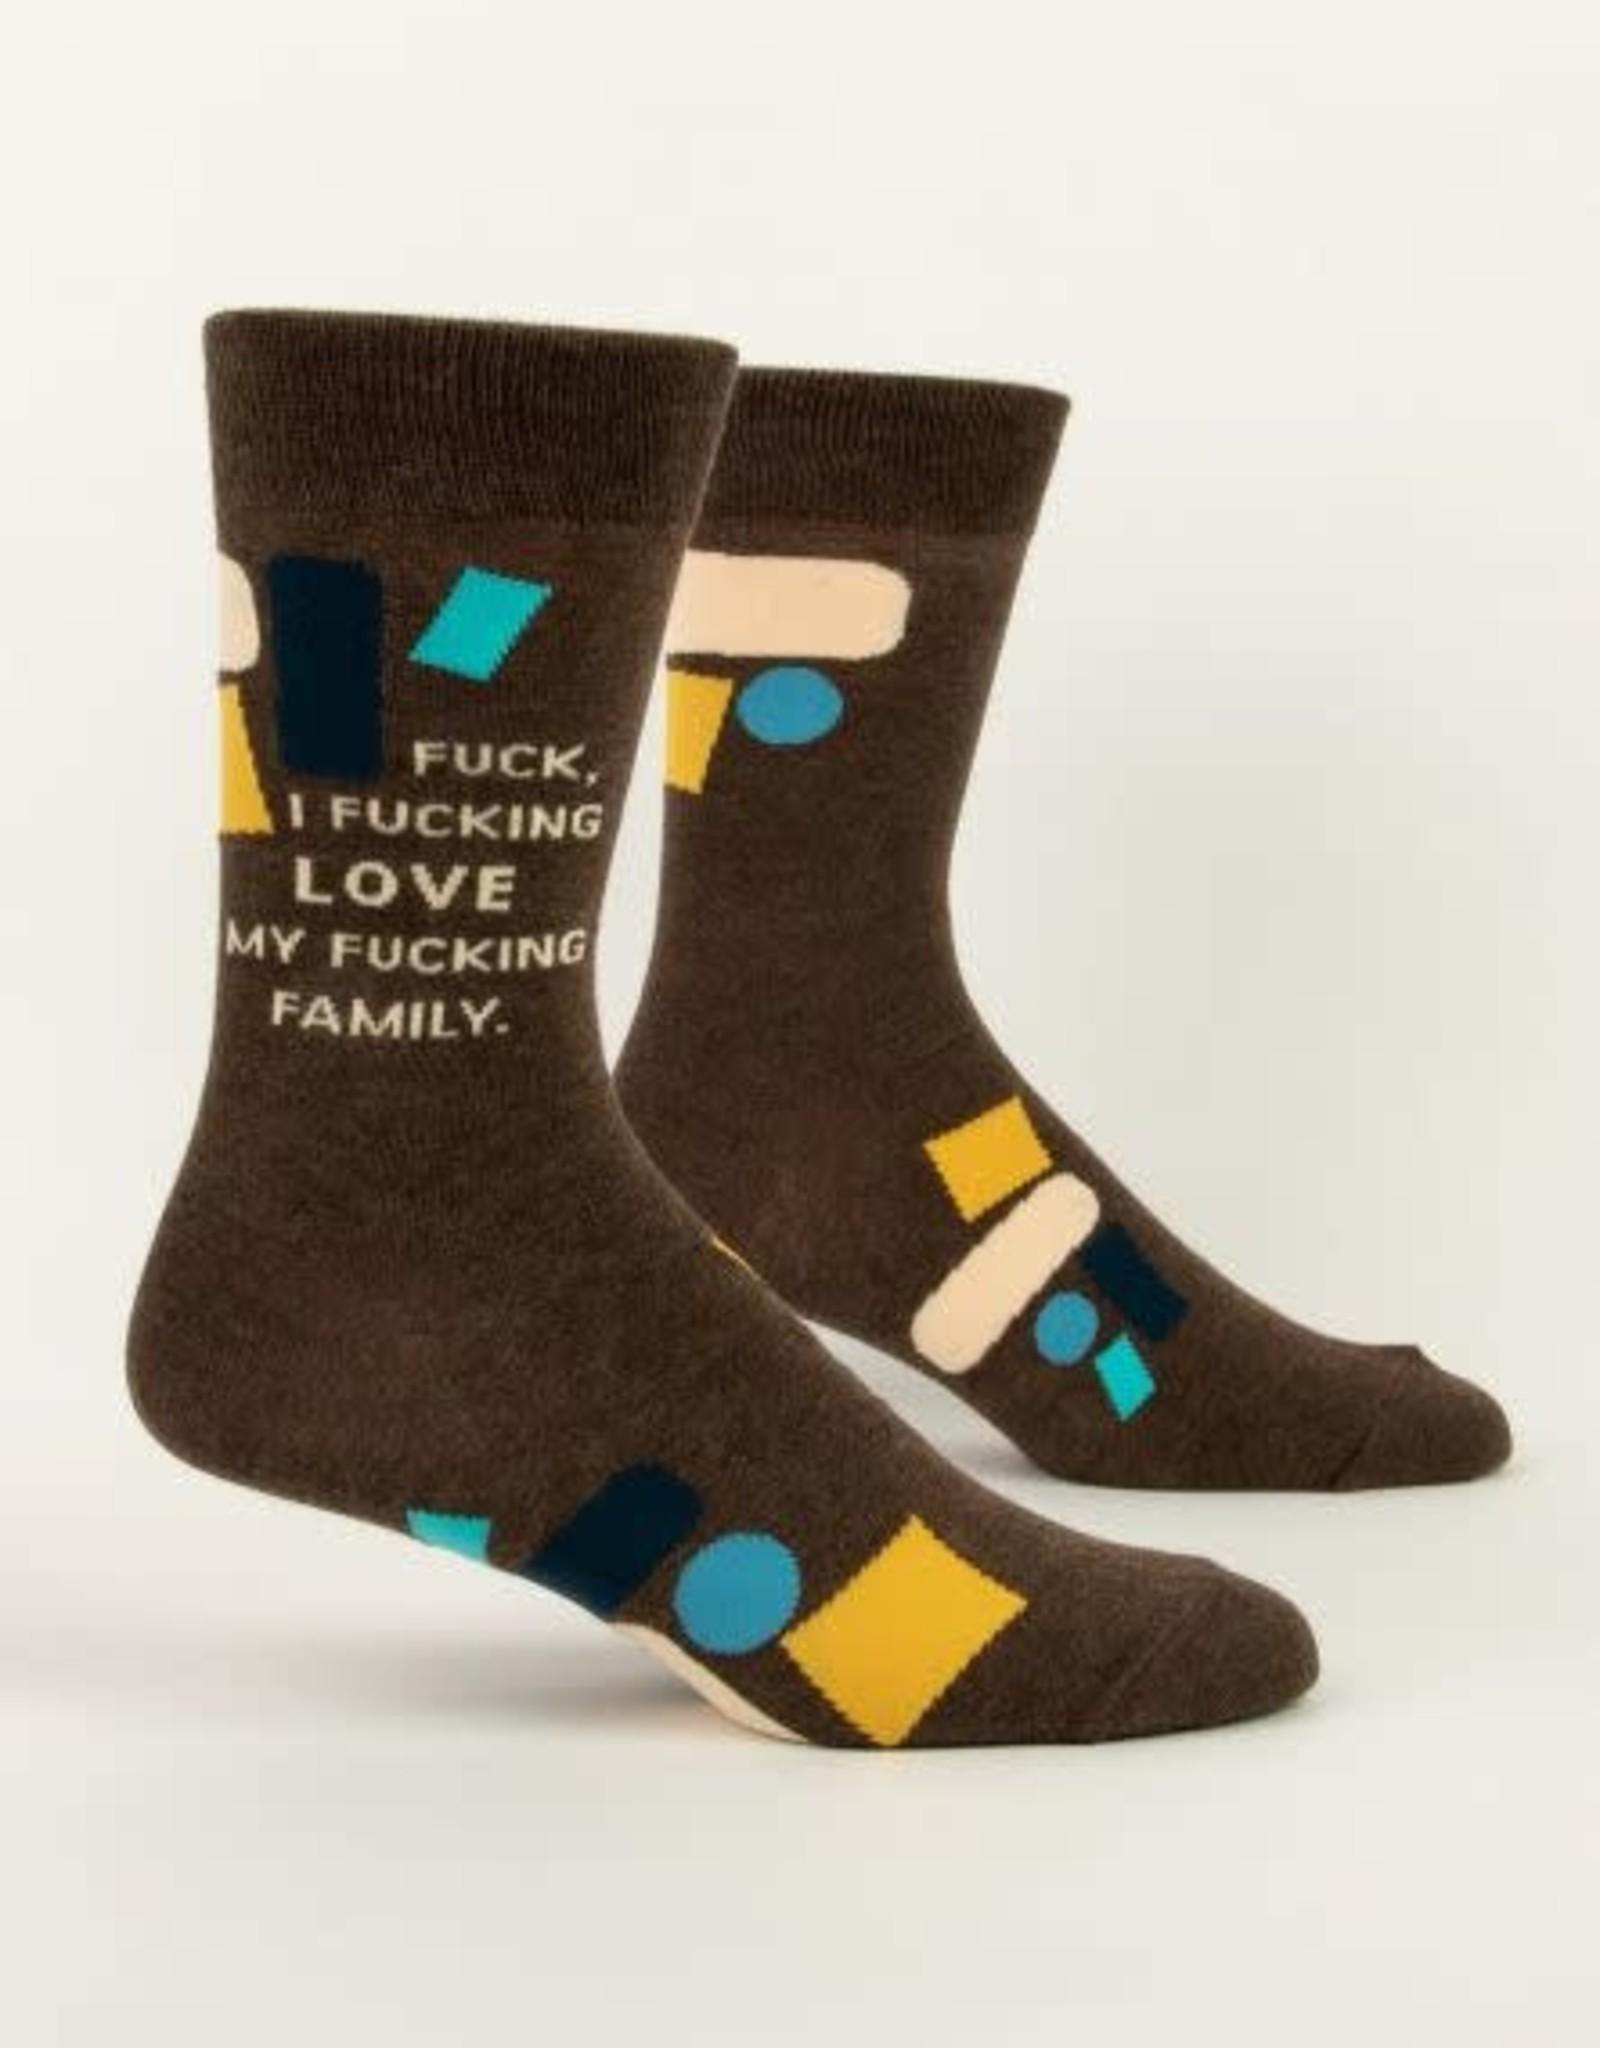 Blue Q Blue Q Men's Crew Socks F I Love My Fam